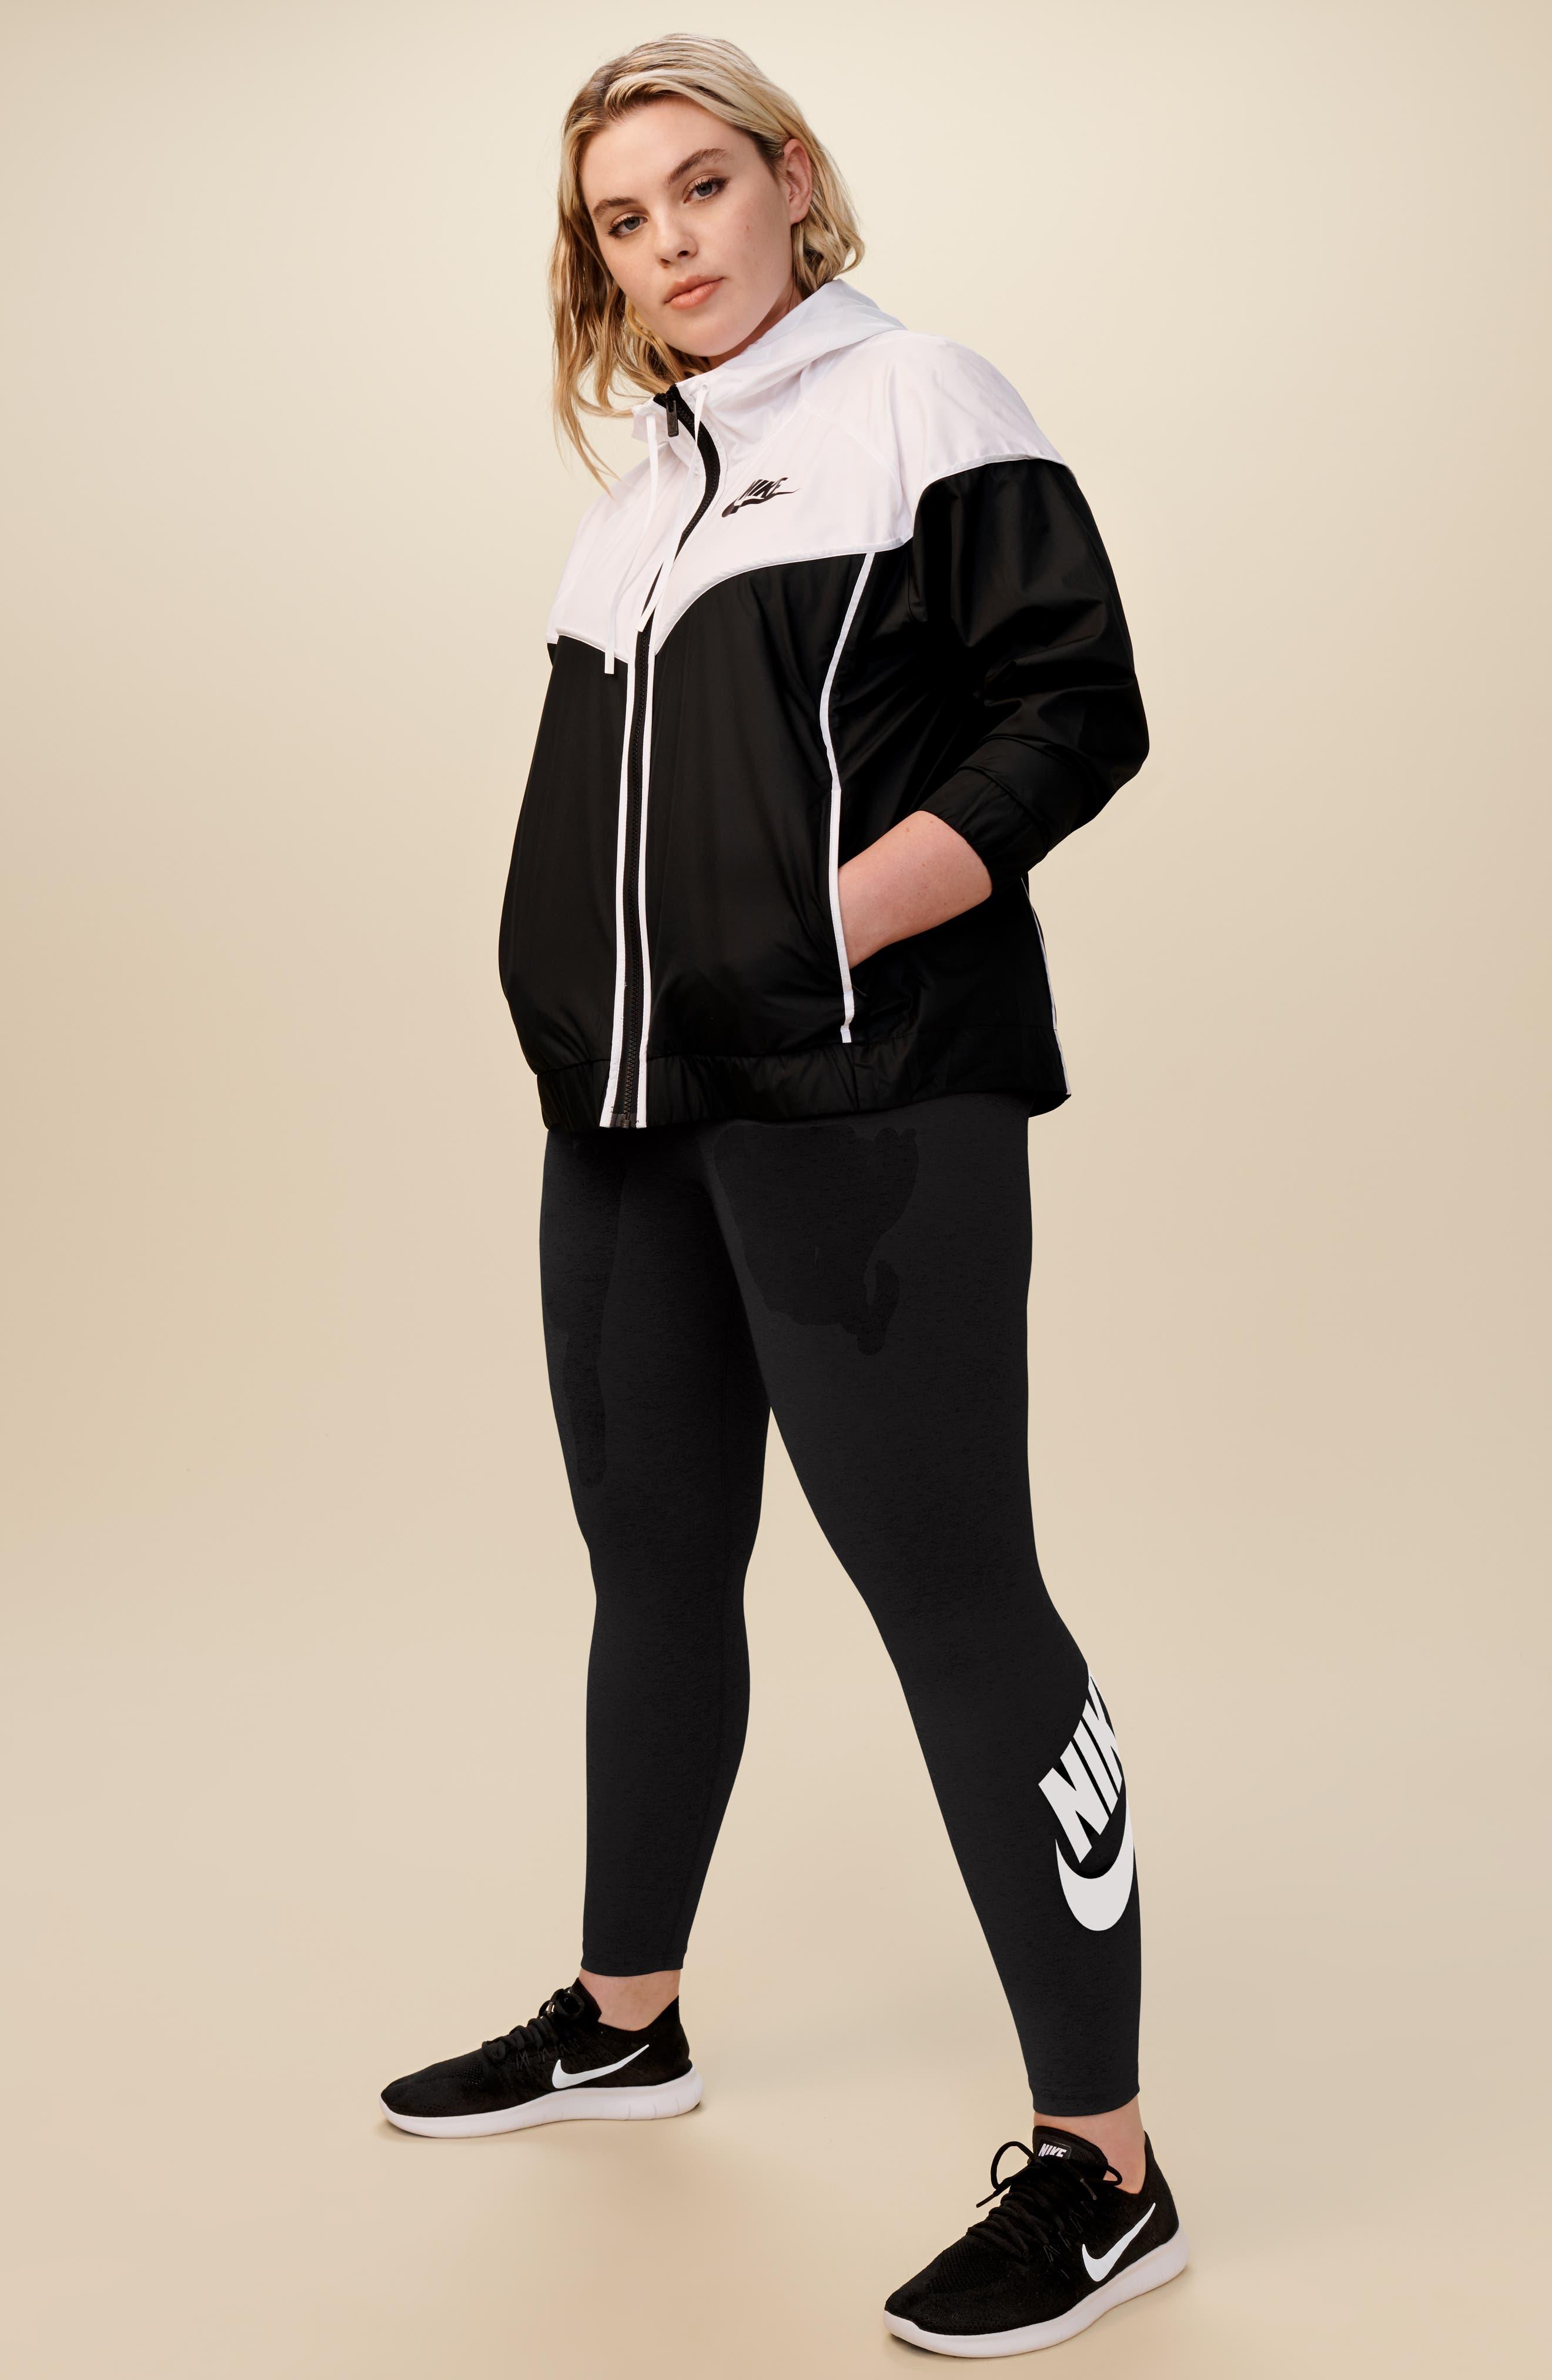 Sportswear Windrunner Jacket,                             Alternate thumbnail 3, color,                             SIGNAL BLUE/ CRIMSON TINT